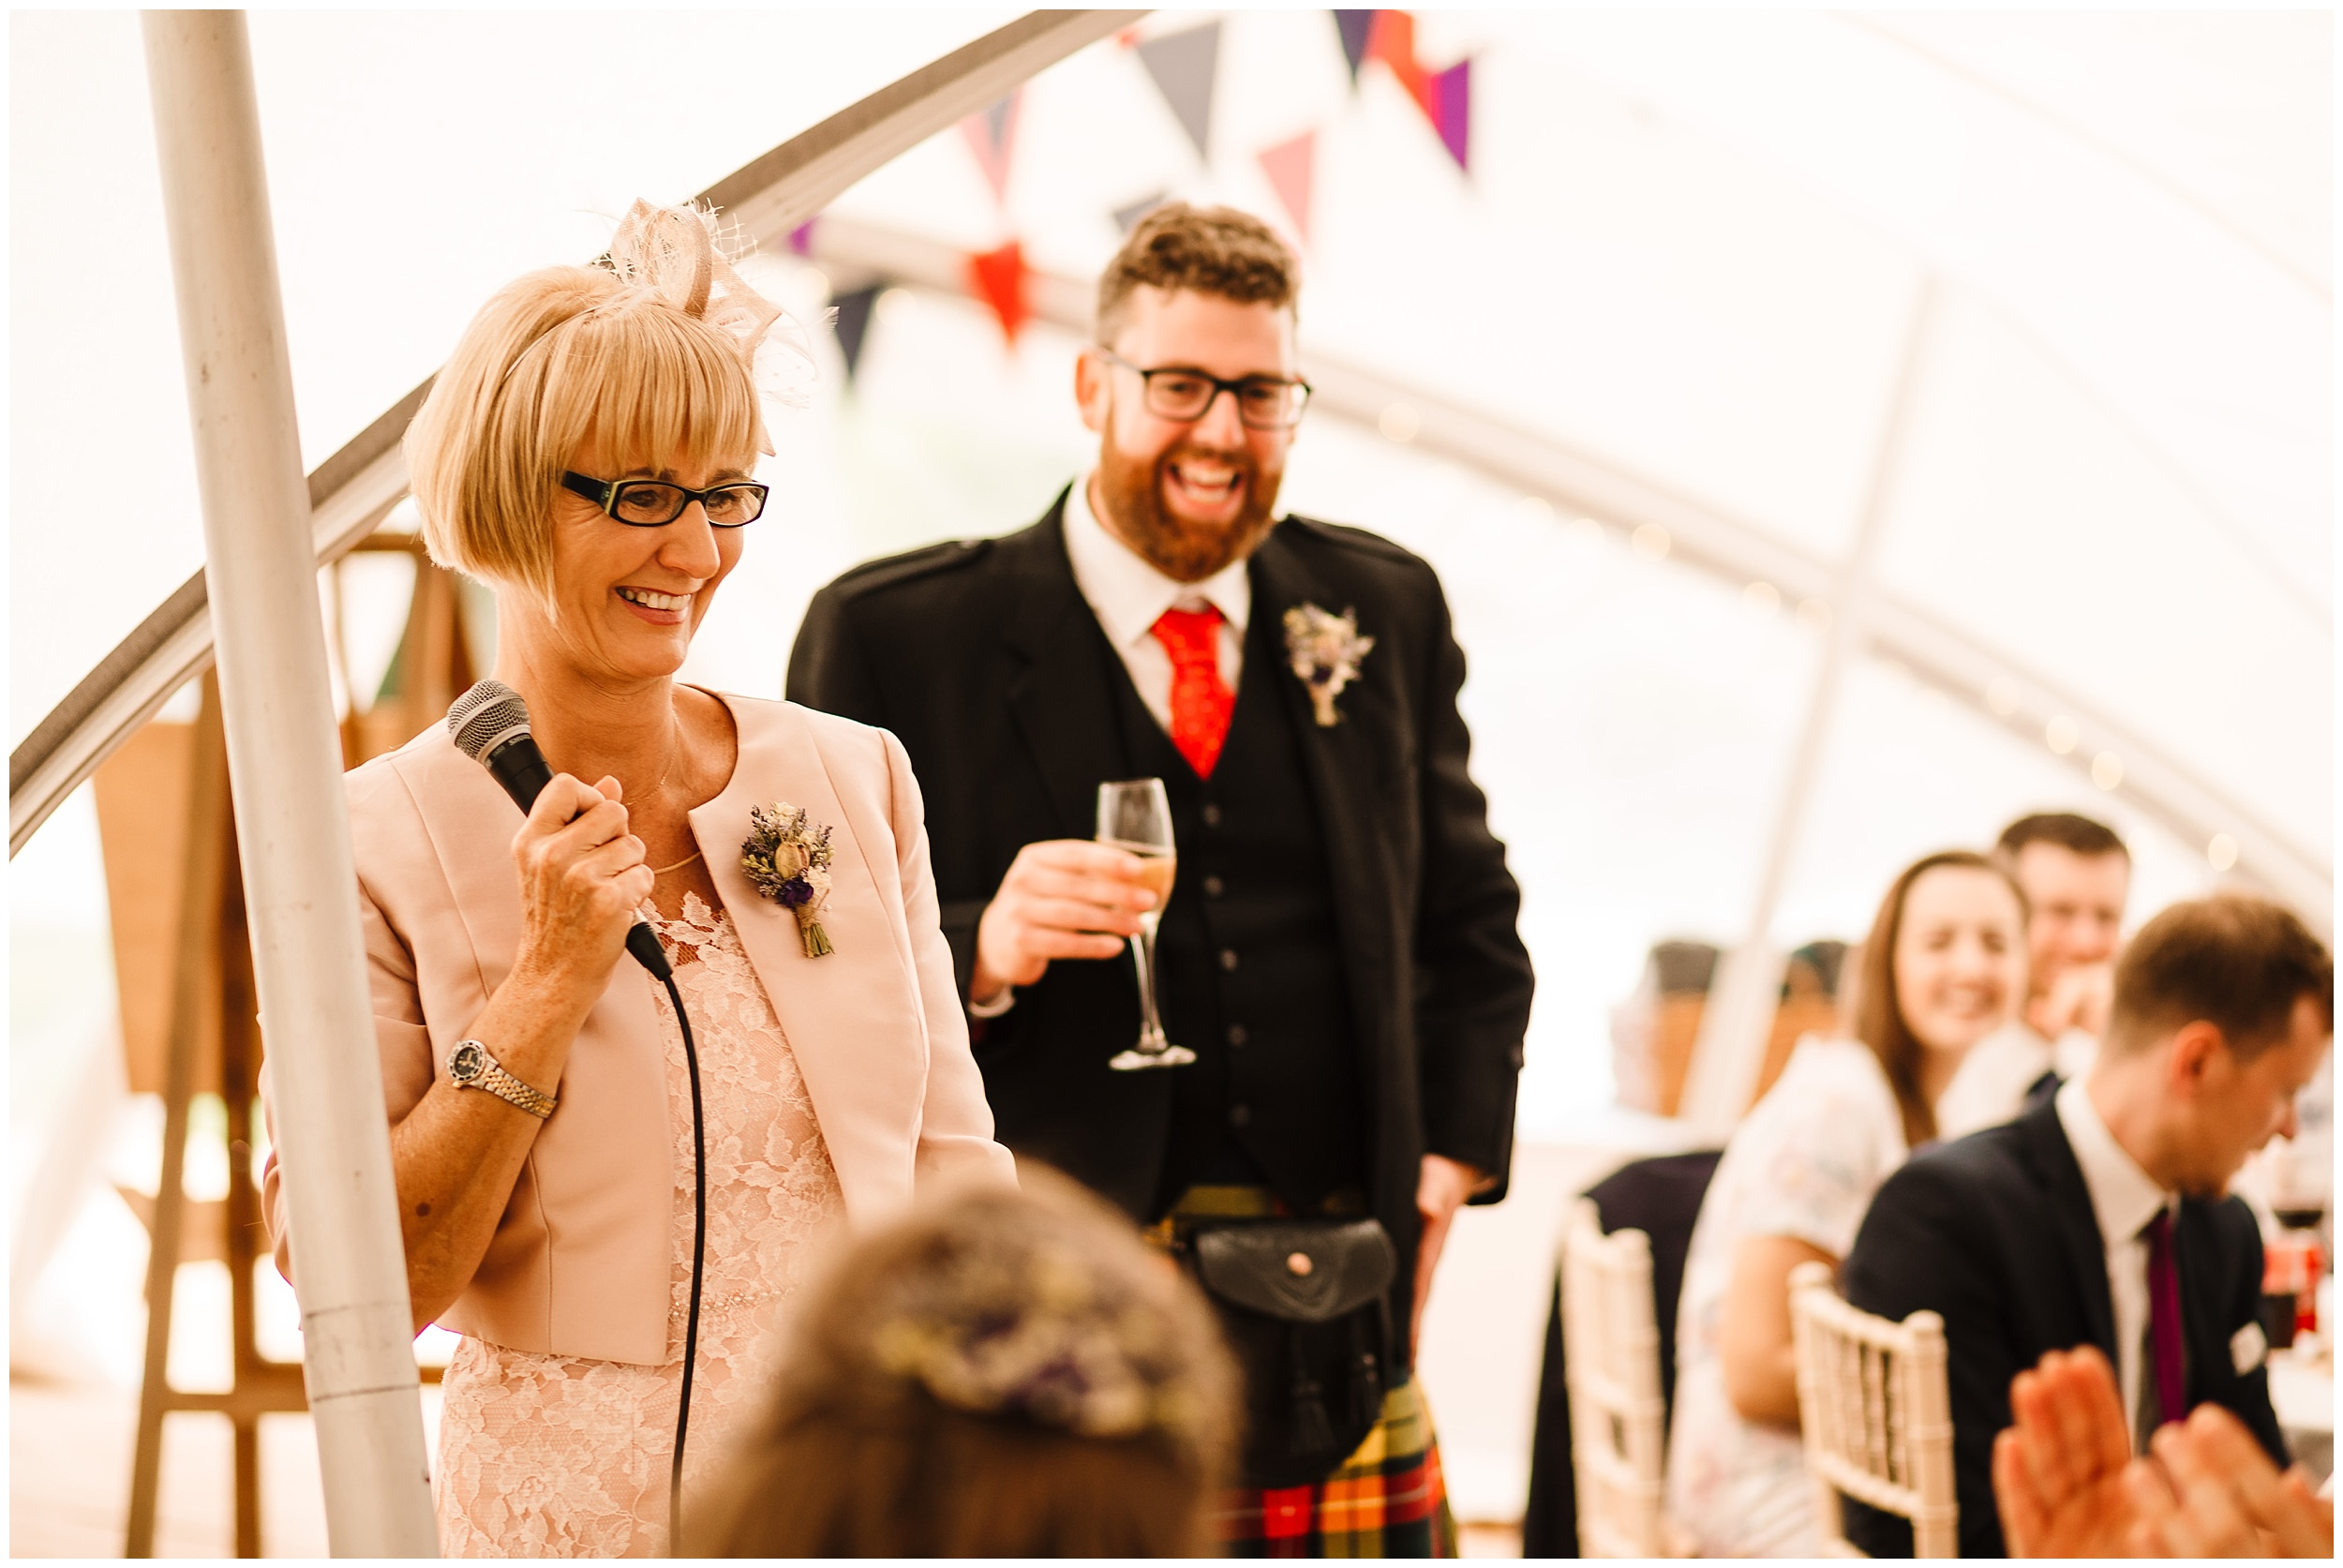 YORKSHIRE OUTDOOR WEDDING PHOTOGRAPHER LUCY ALEX_0031.jpg